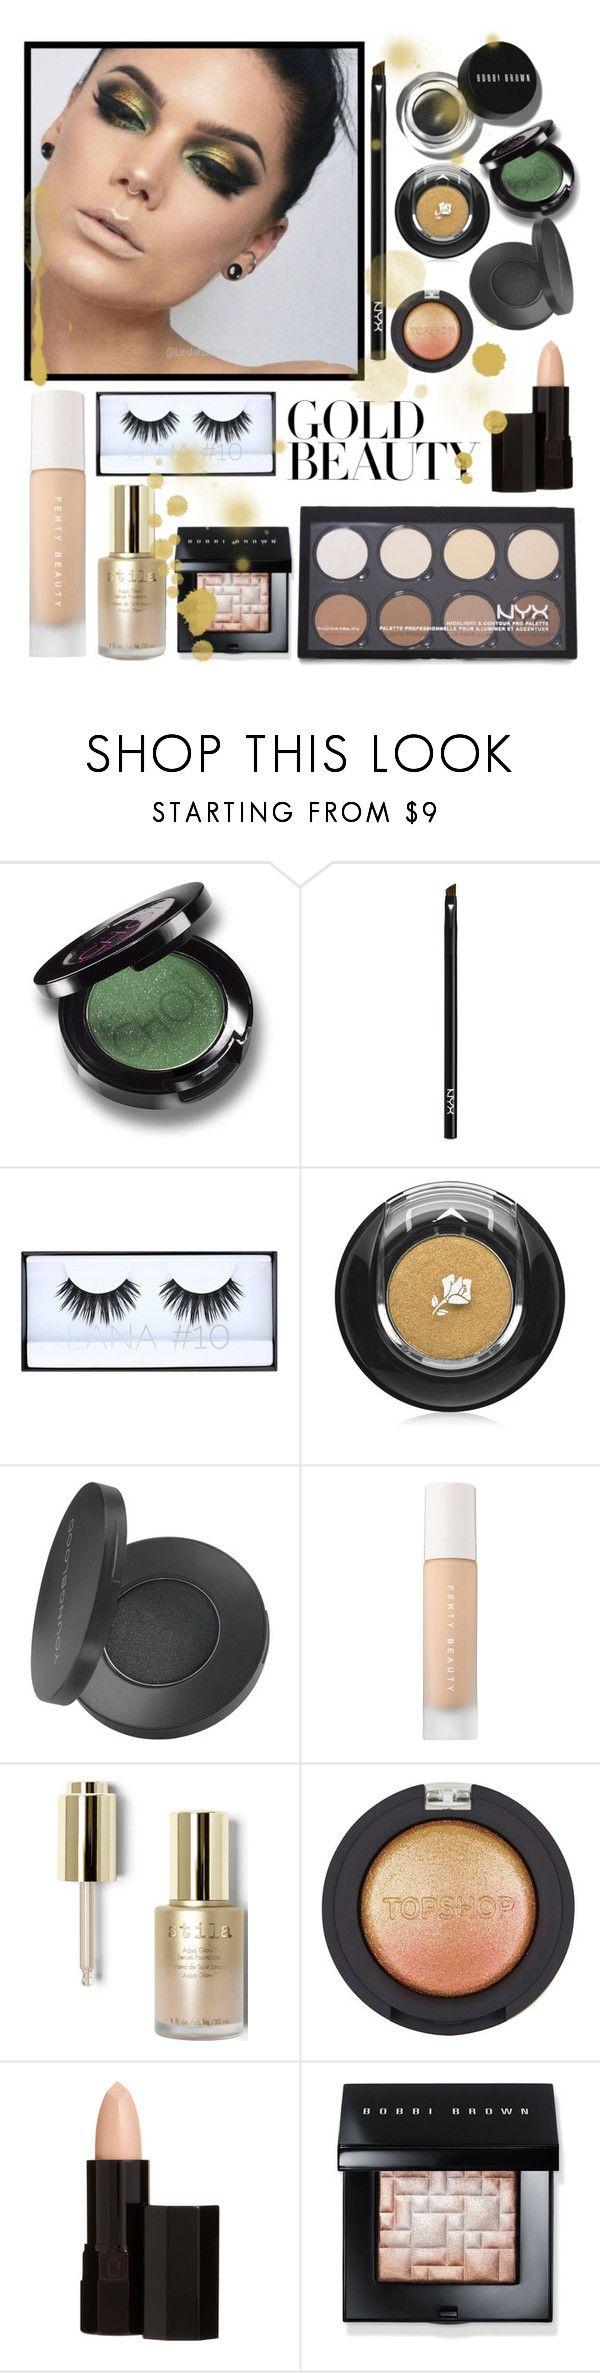 """Rockstar Gold"" by amelievia ❤ liked on Polyvore featuring beauty, Christina Choi Cosmetics, Bobbi Brown Cosmetics, NYX, Huda Beauty, Lancôme, Youngblood, Puma, Stila and Topshop"